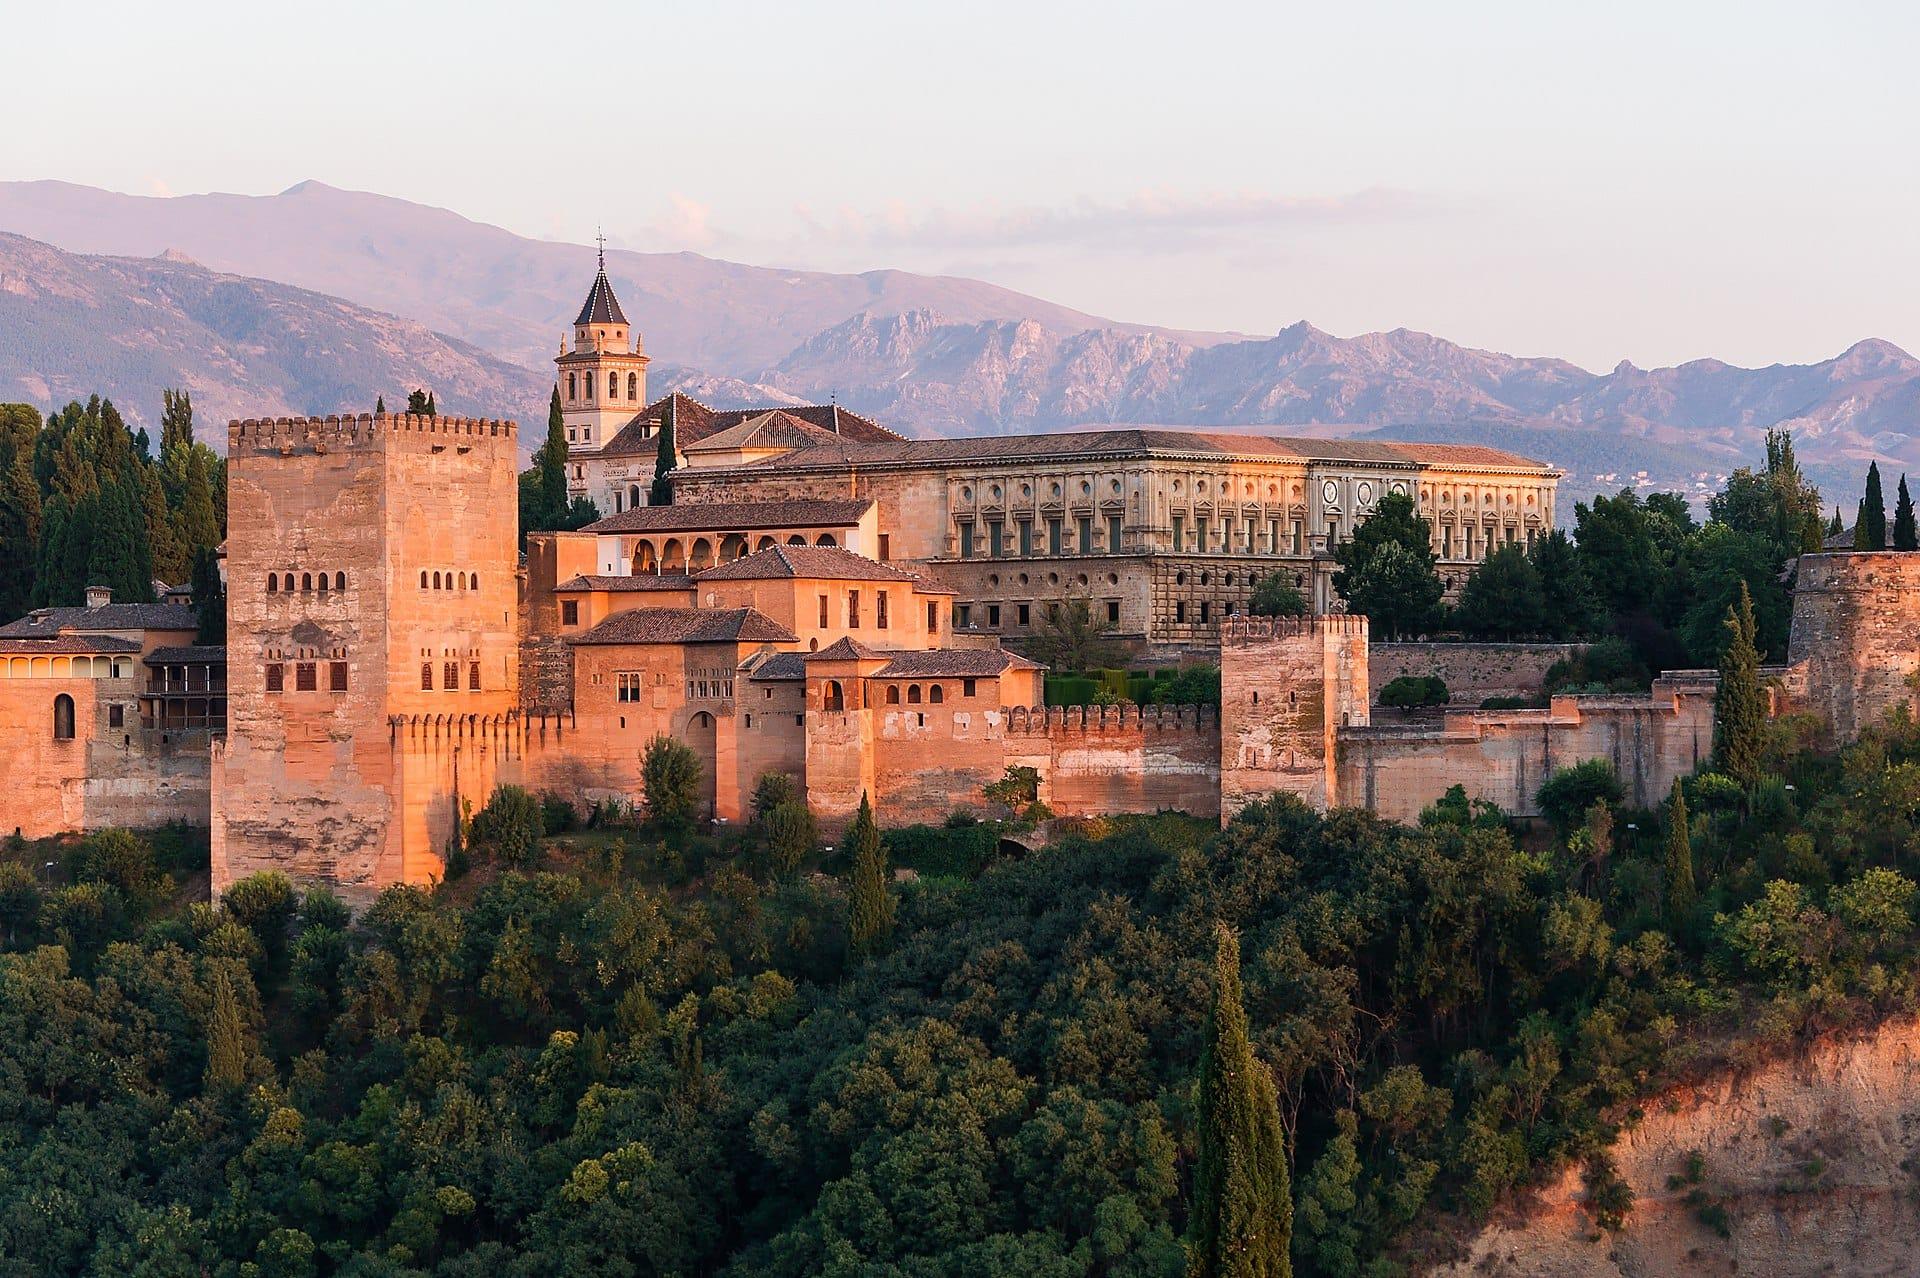 1920px-Dawn_Charles_V_Palace_Alhambra_Granada_Andalusia_Spain.jpg